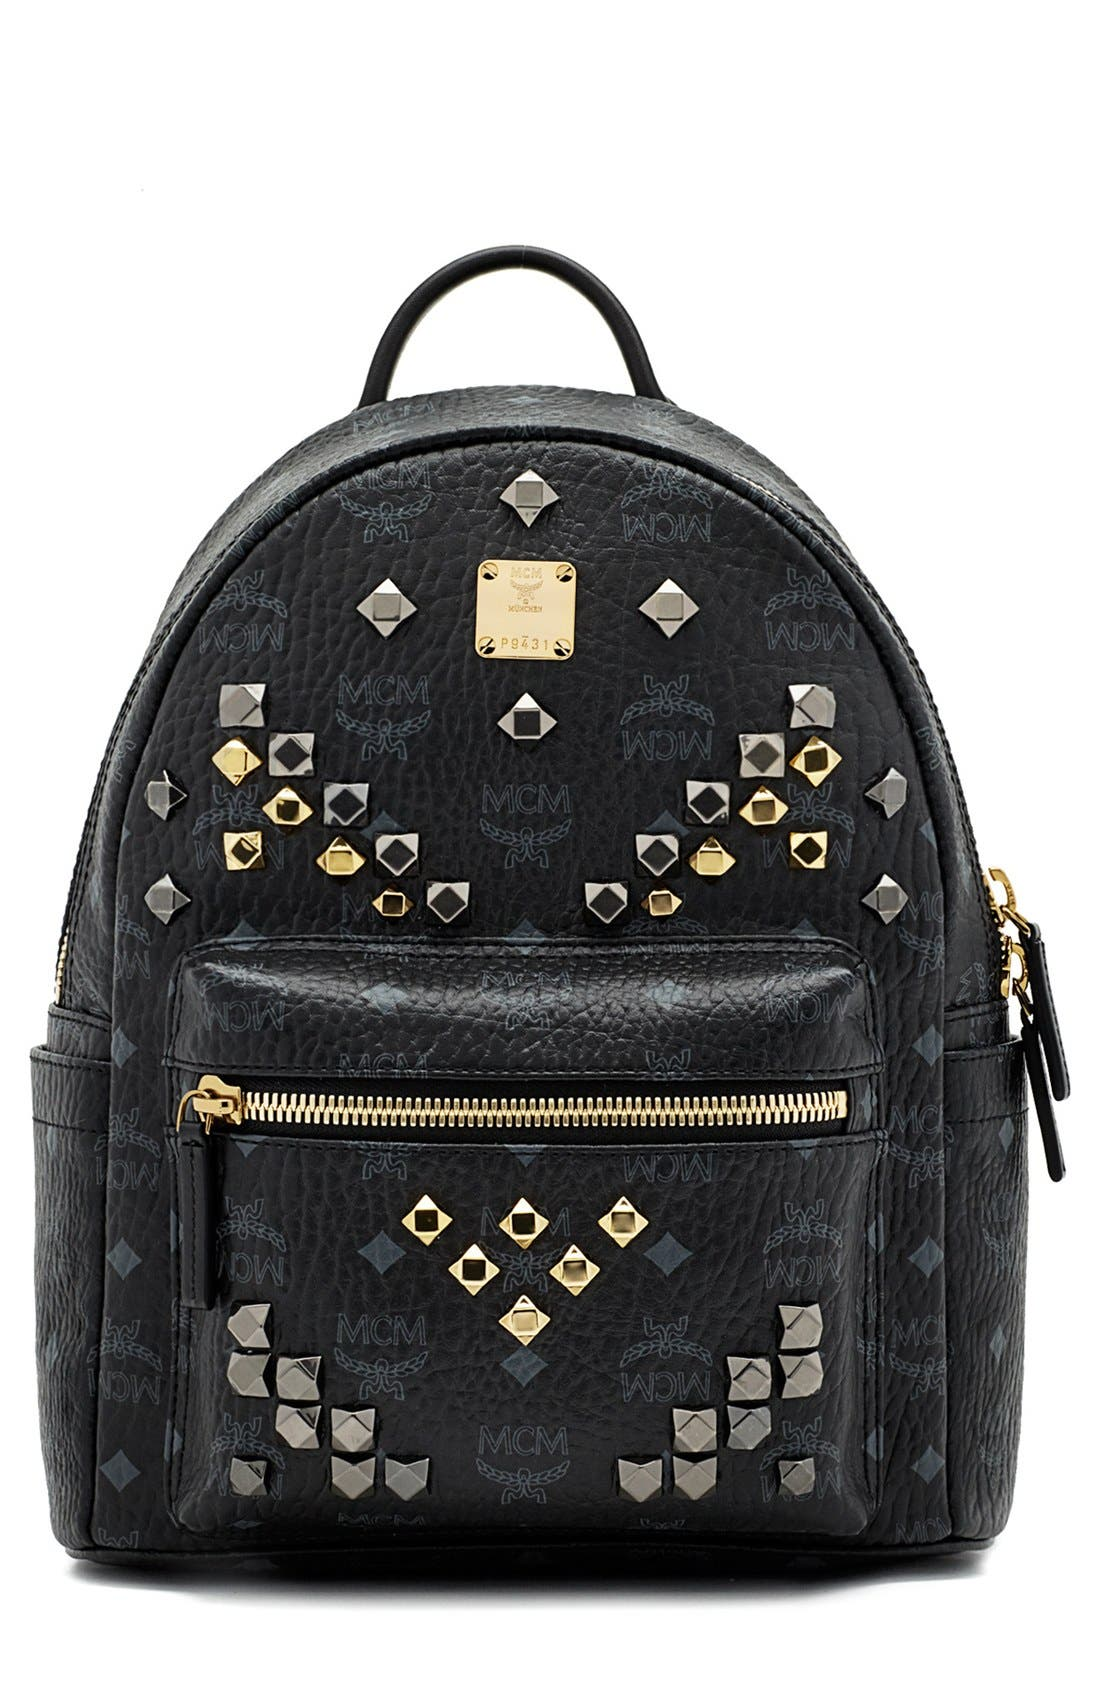 Main Image - MCM 'Small Stark - Visetos' Studded Backpack